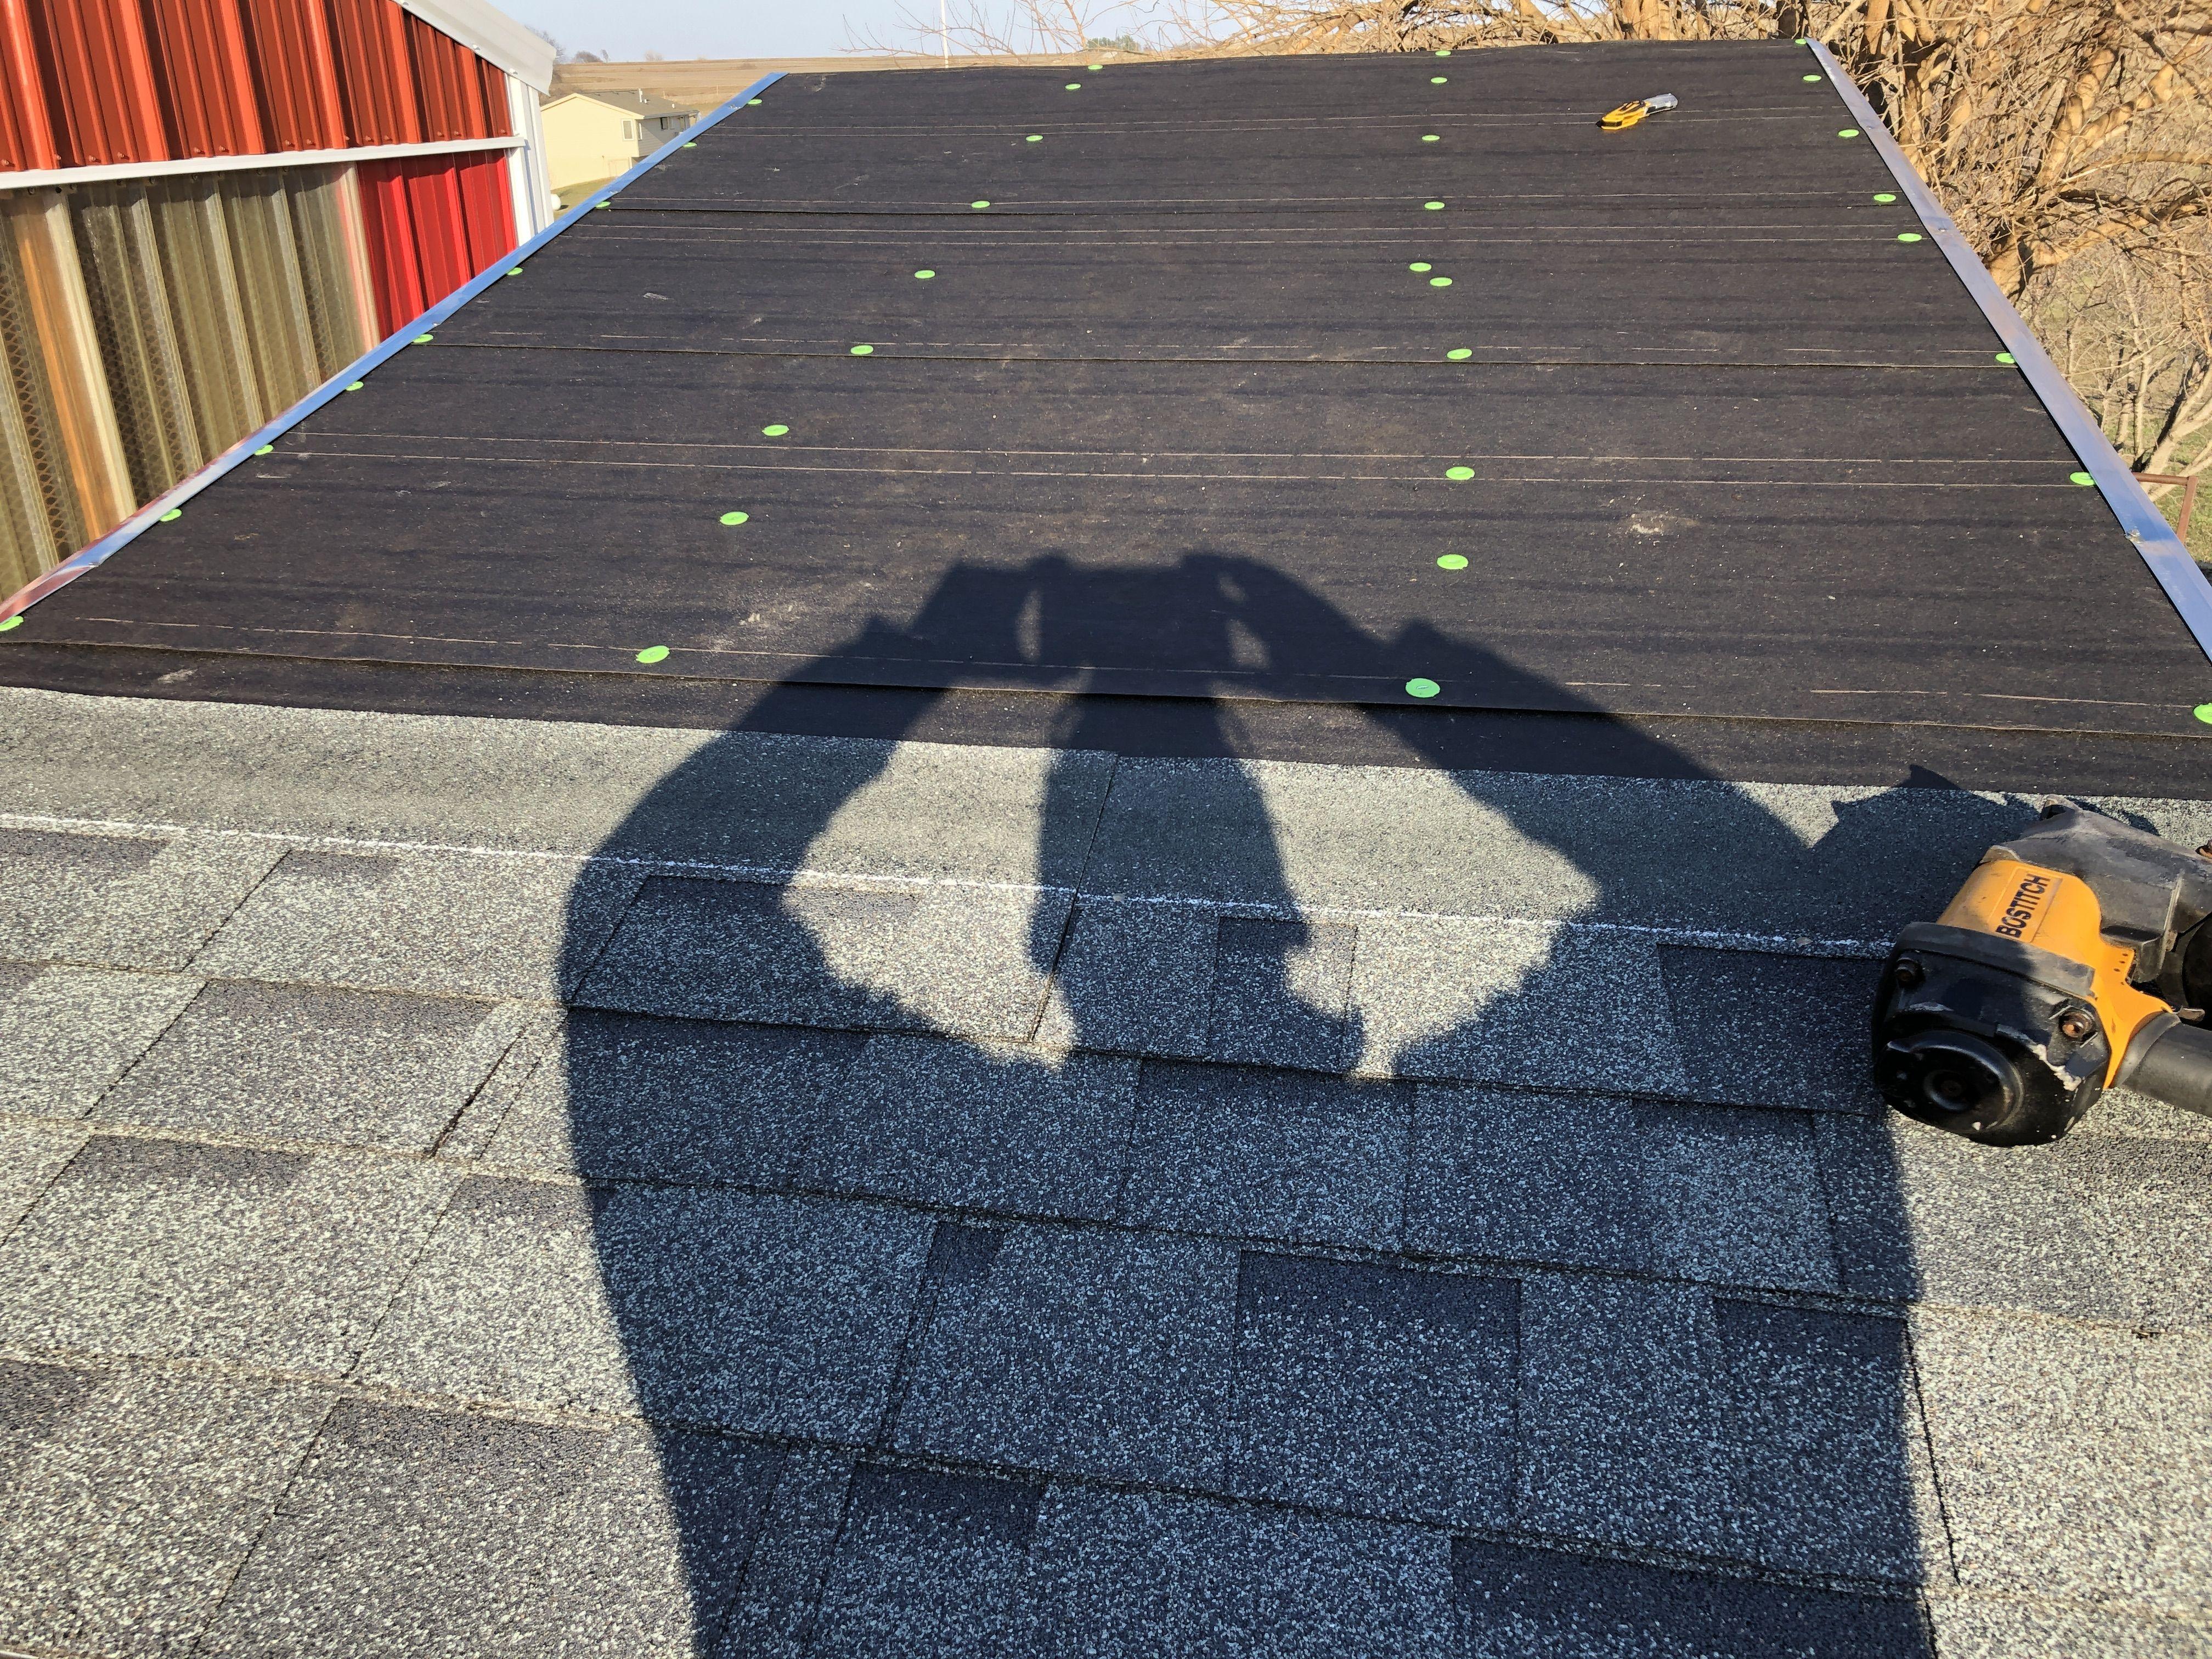 Adding Shingles Asphalt Shingles Roofing Materials Shingling